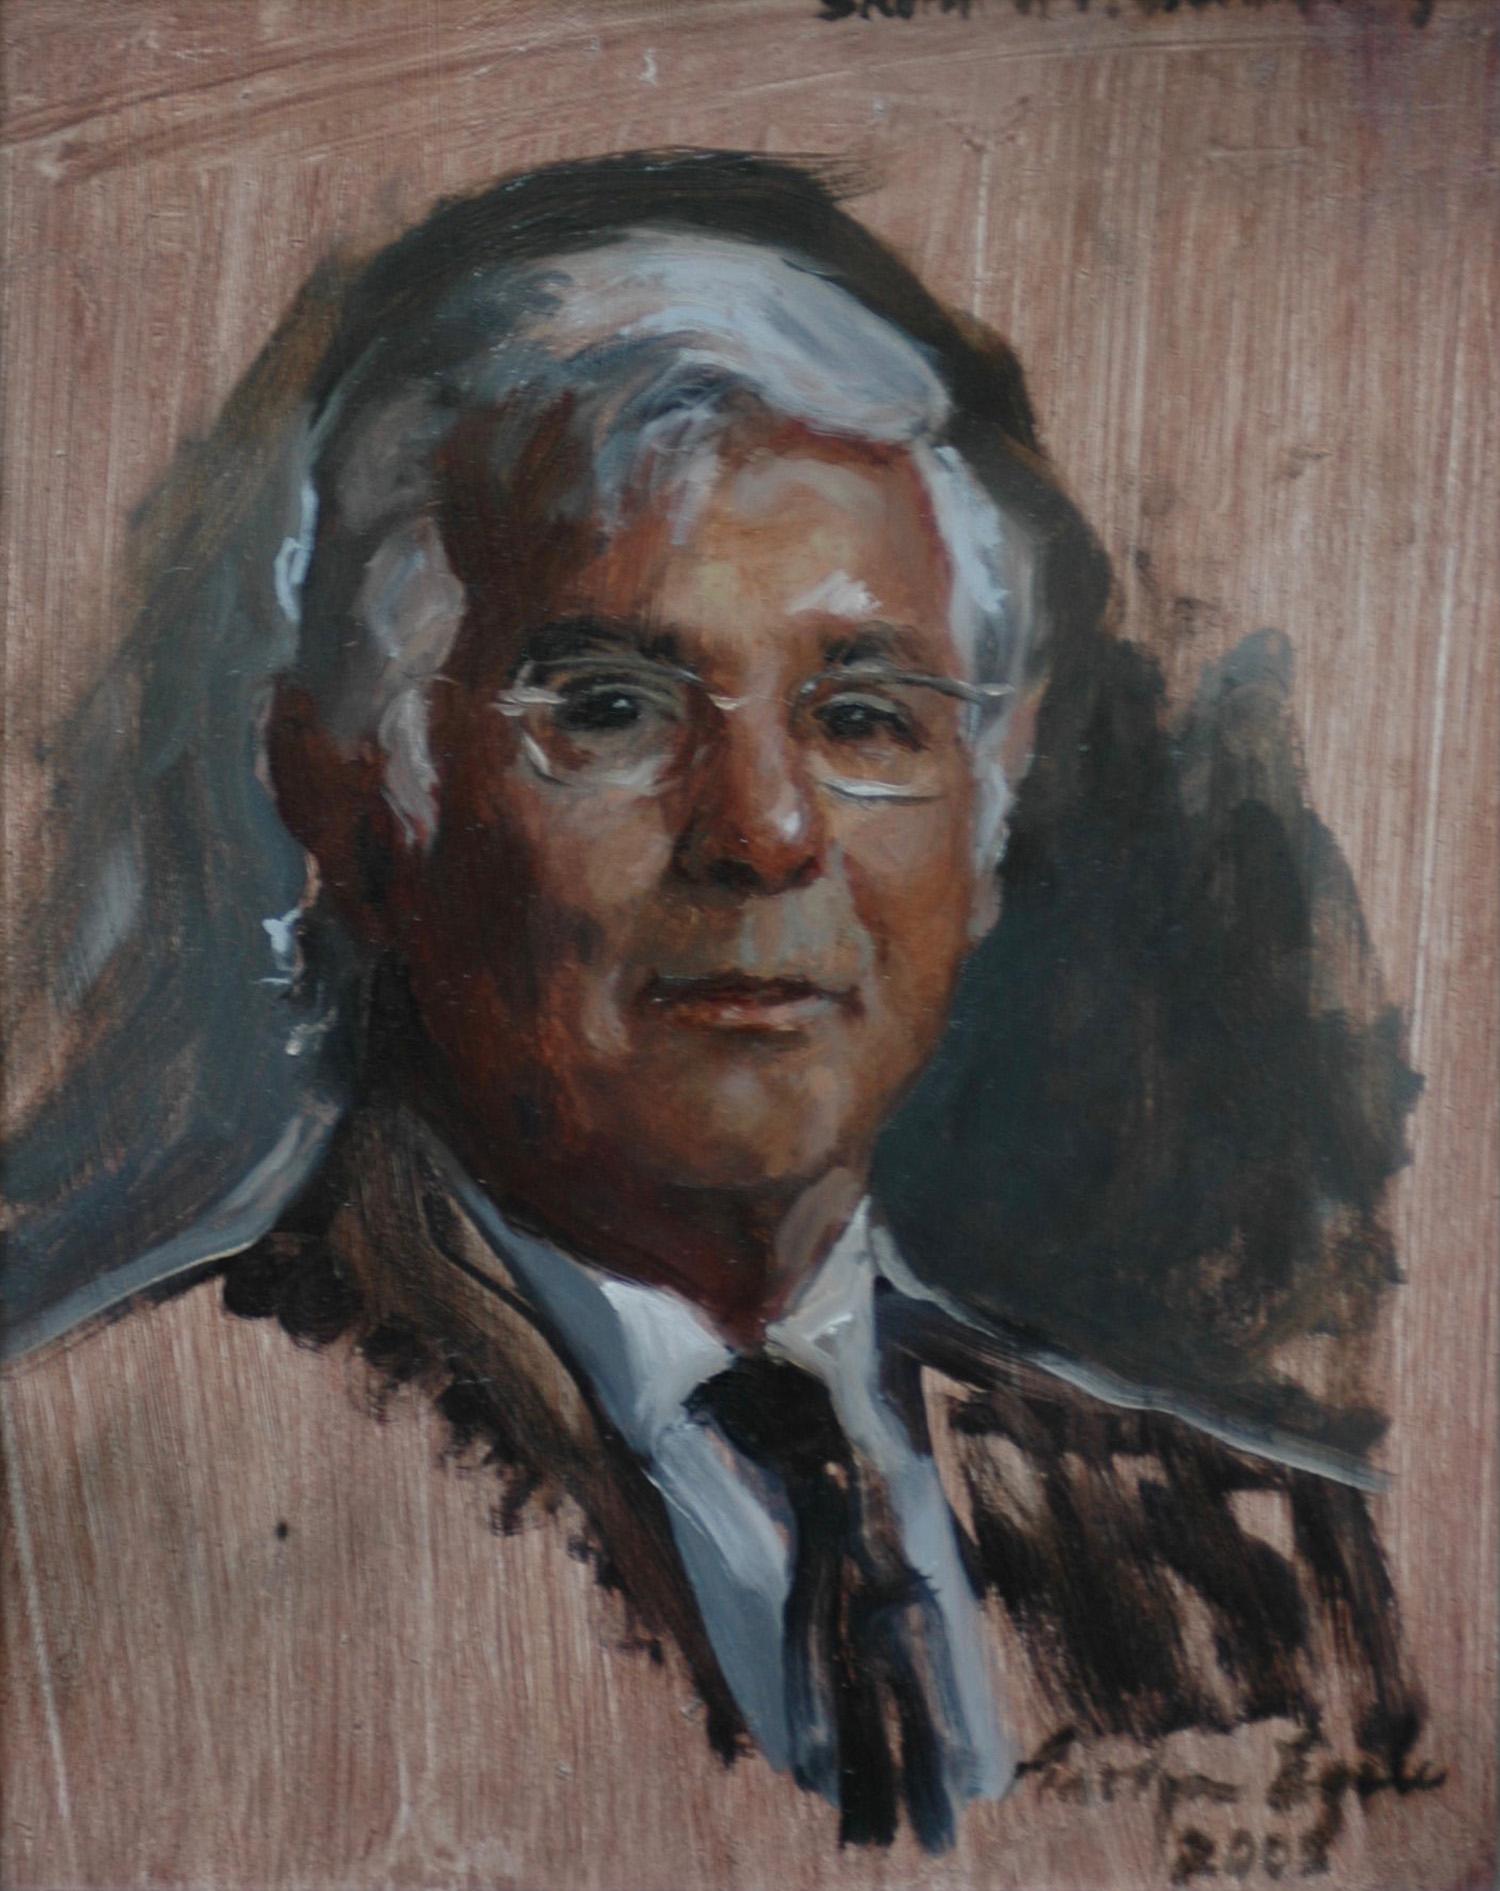 Study for Glendenning Portrait, NFS